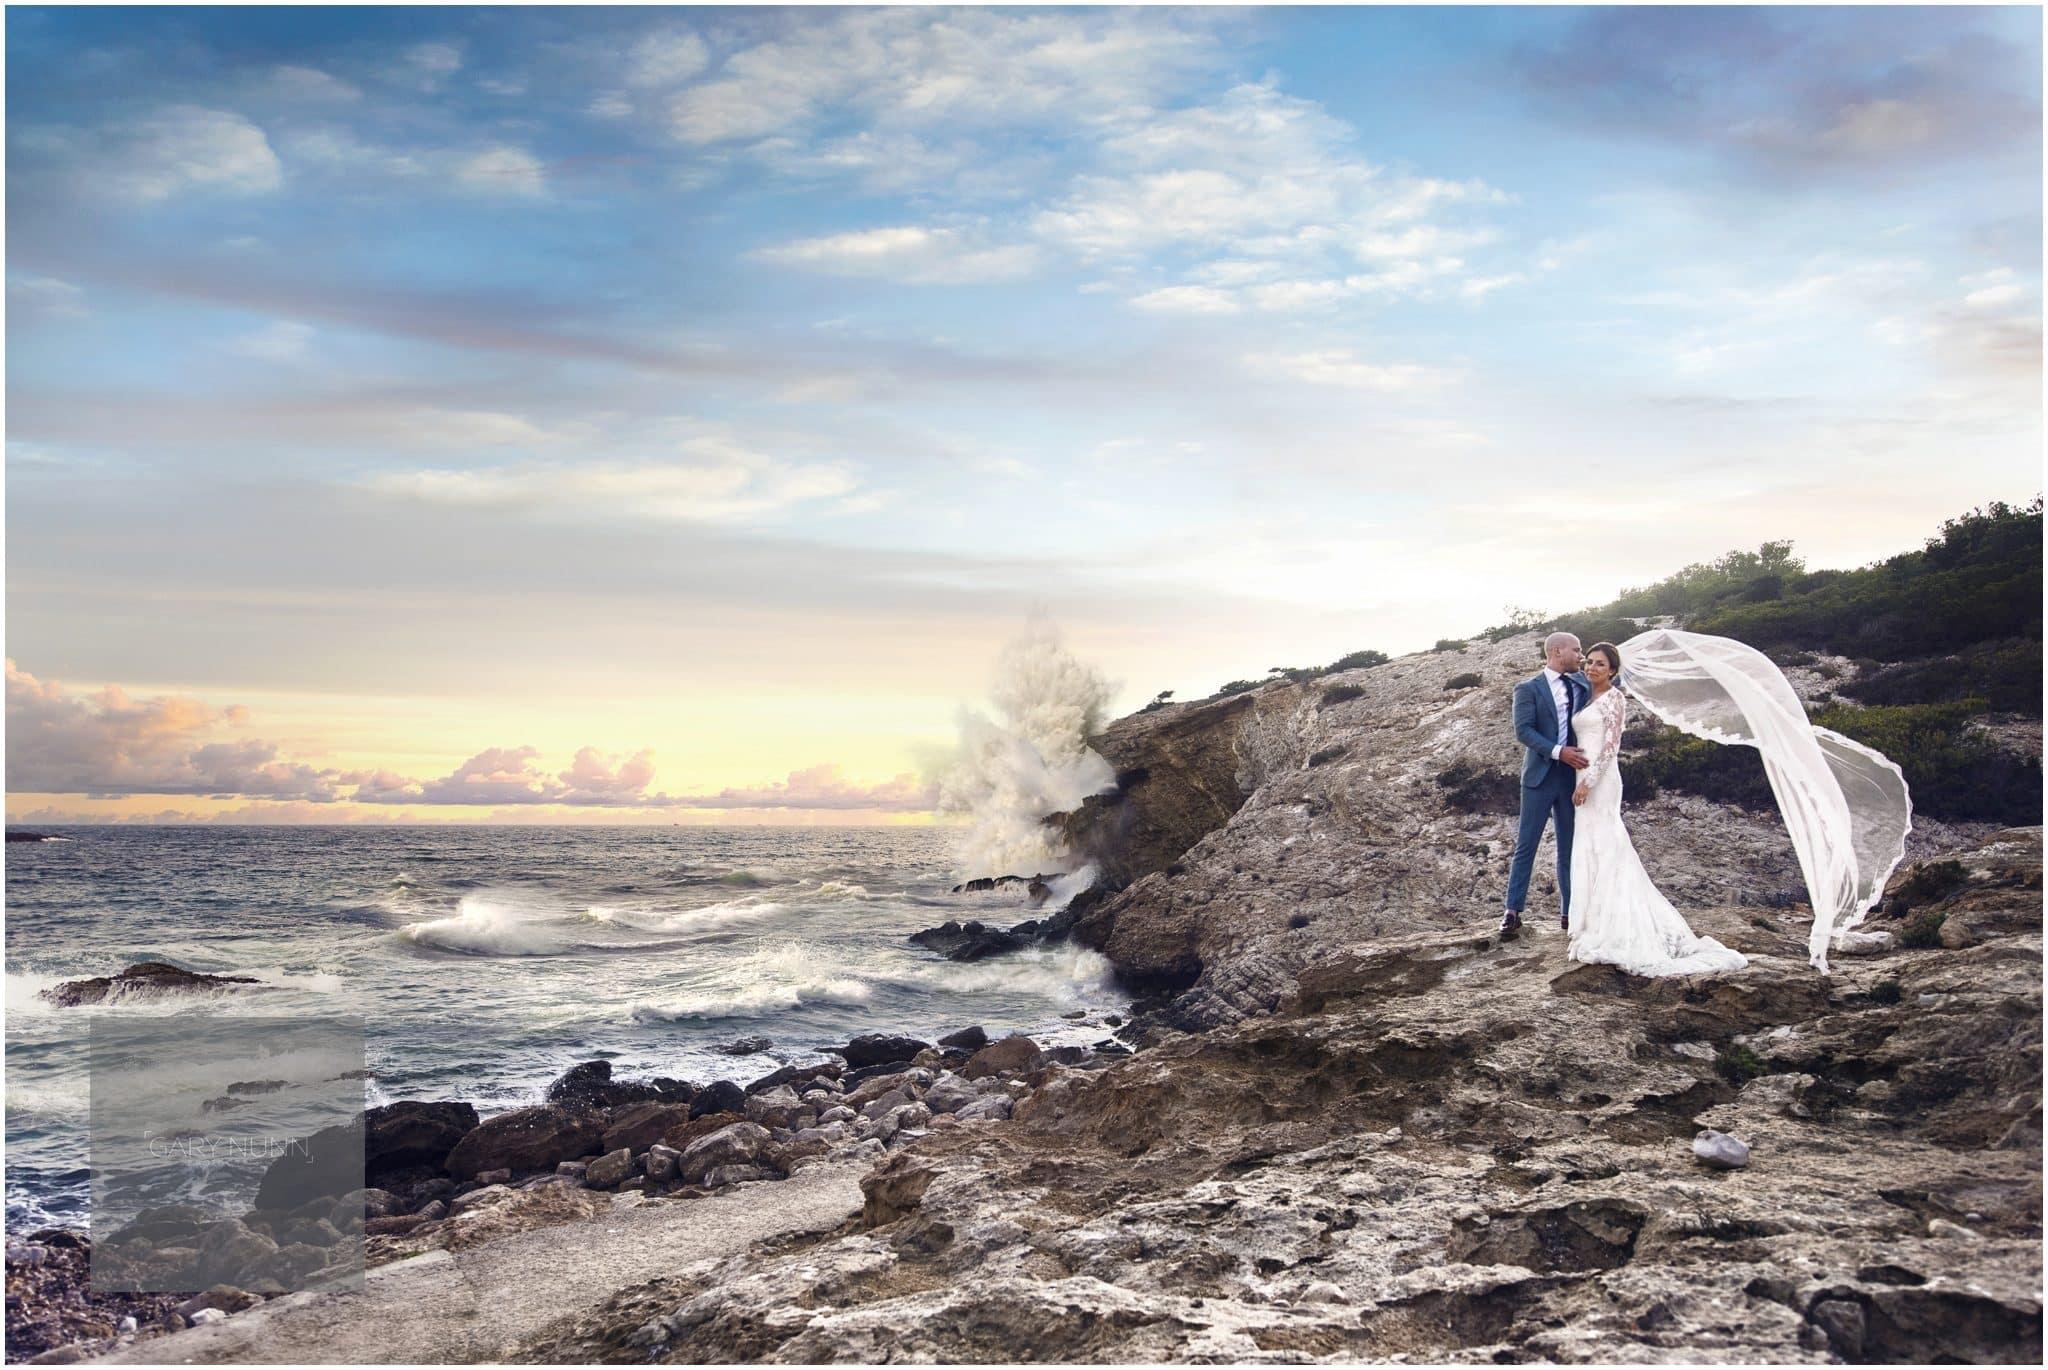 Elixir Shore Club, Ibiza Wedding Photography, essential wedding photos, wedding gifts, milton keynes wedding photographer,